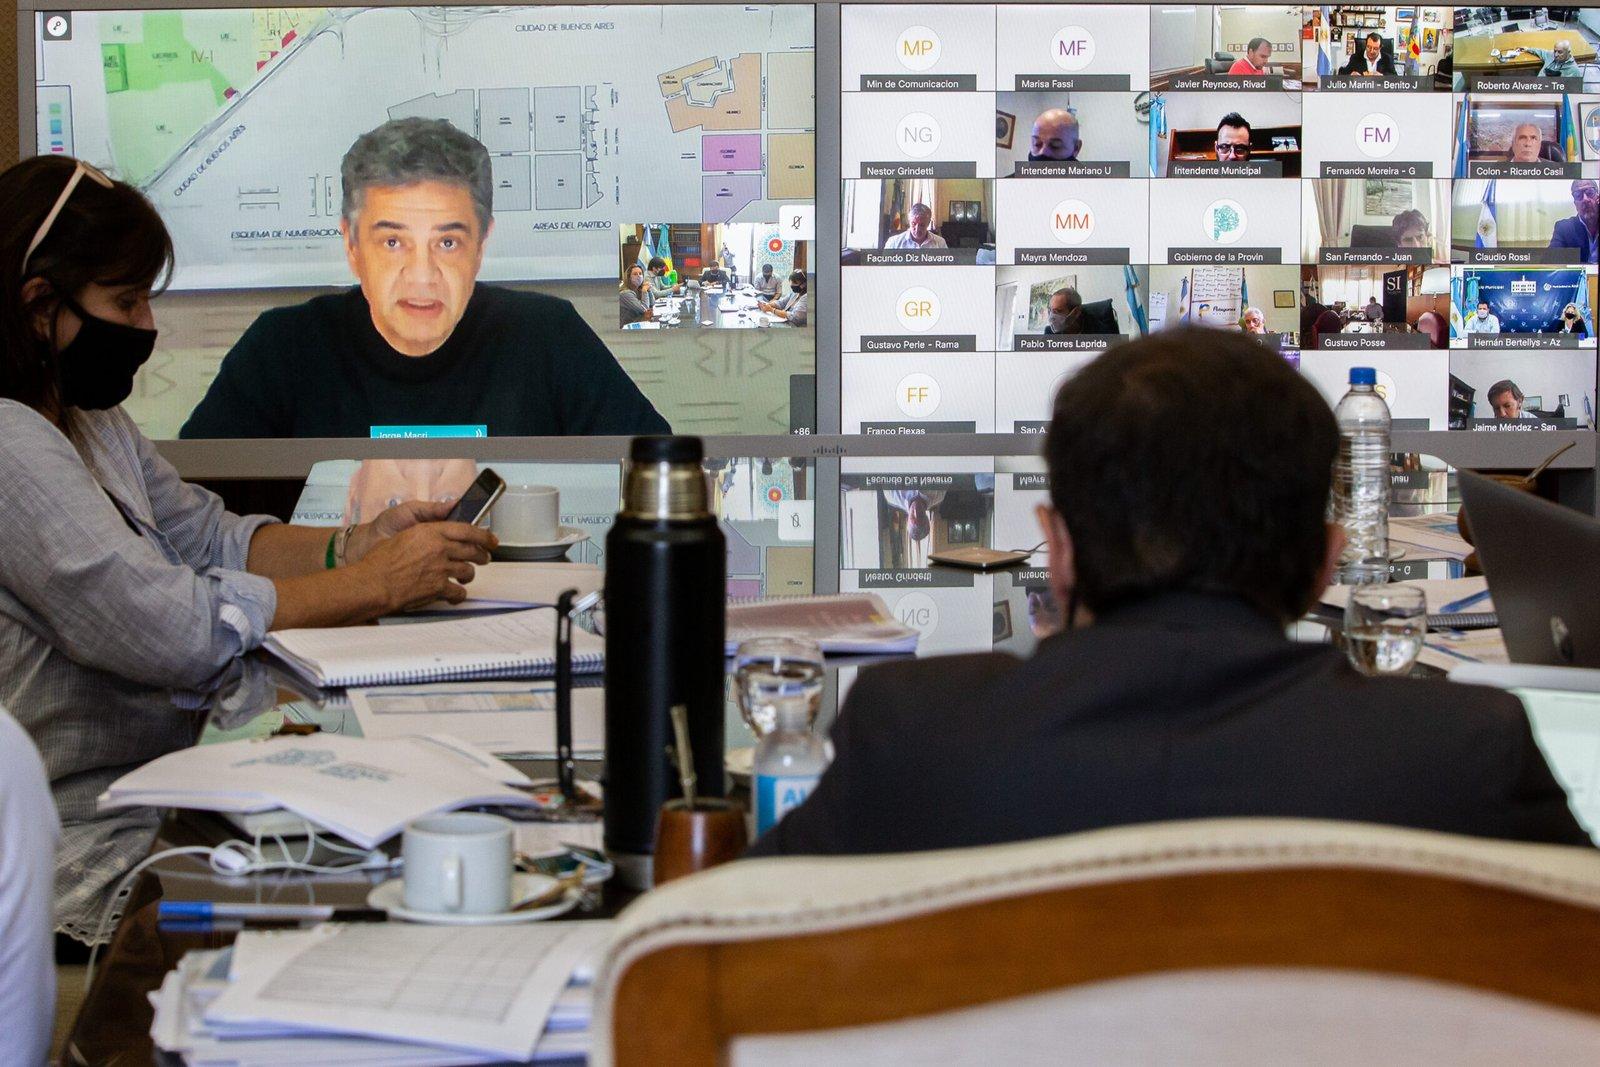 Kicillof se reunió con intendentes para analizar las próximas medidas